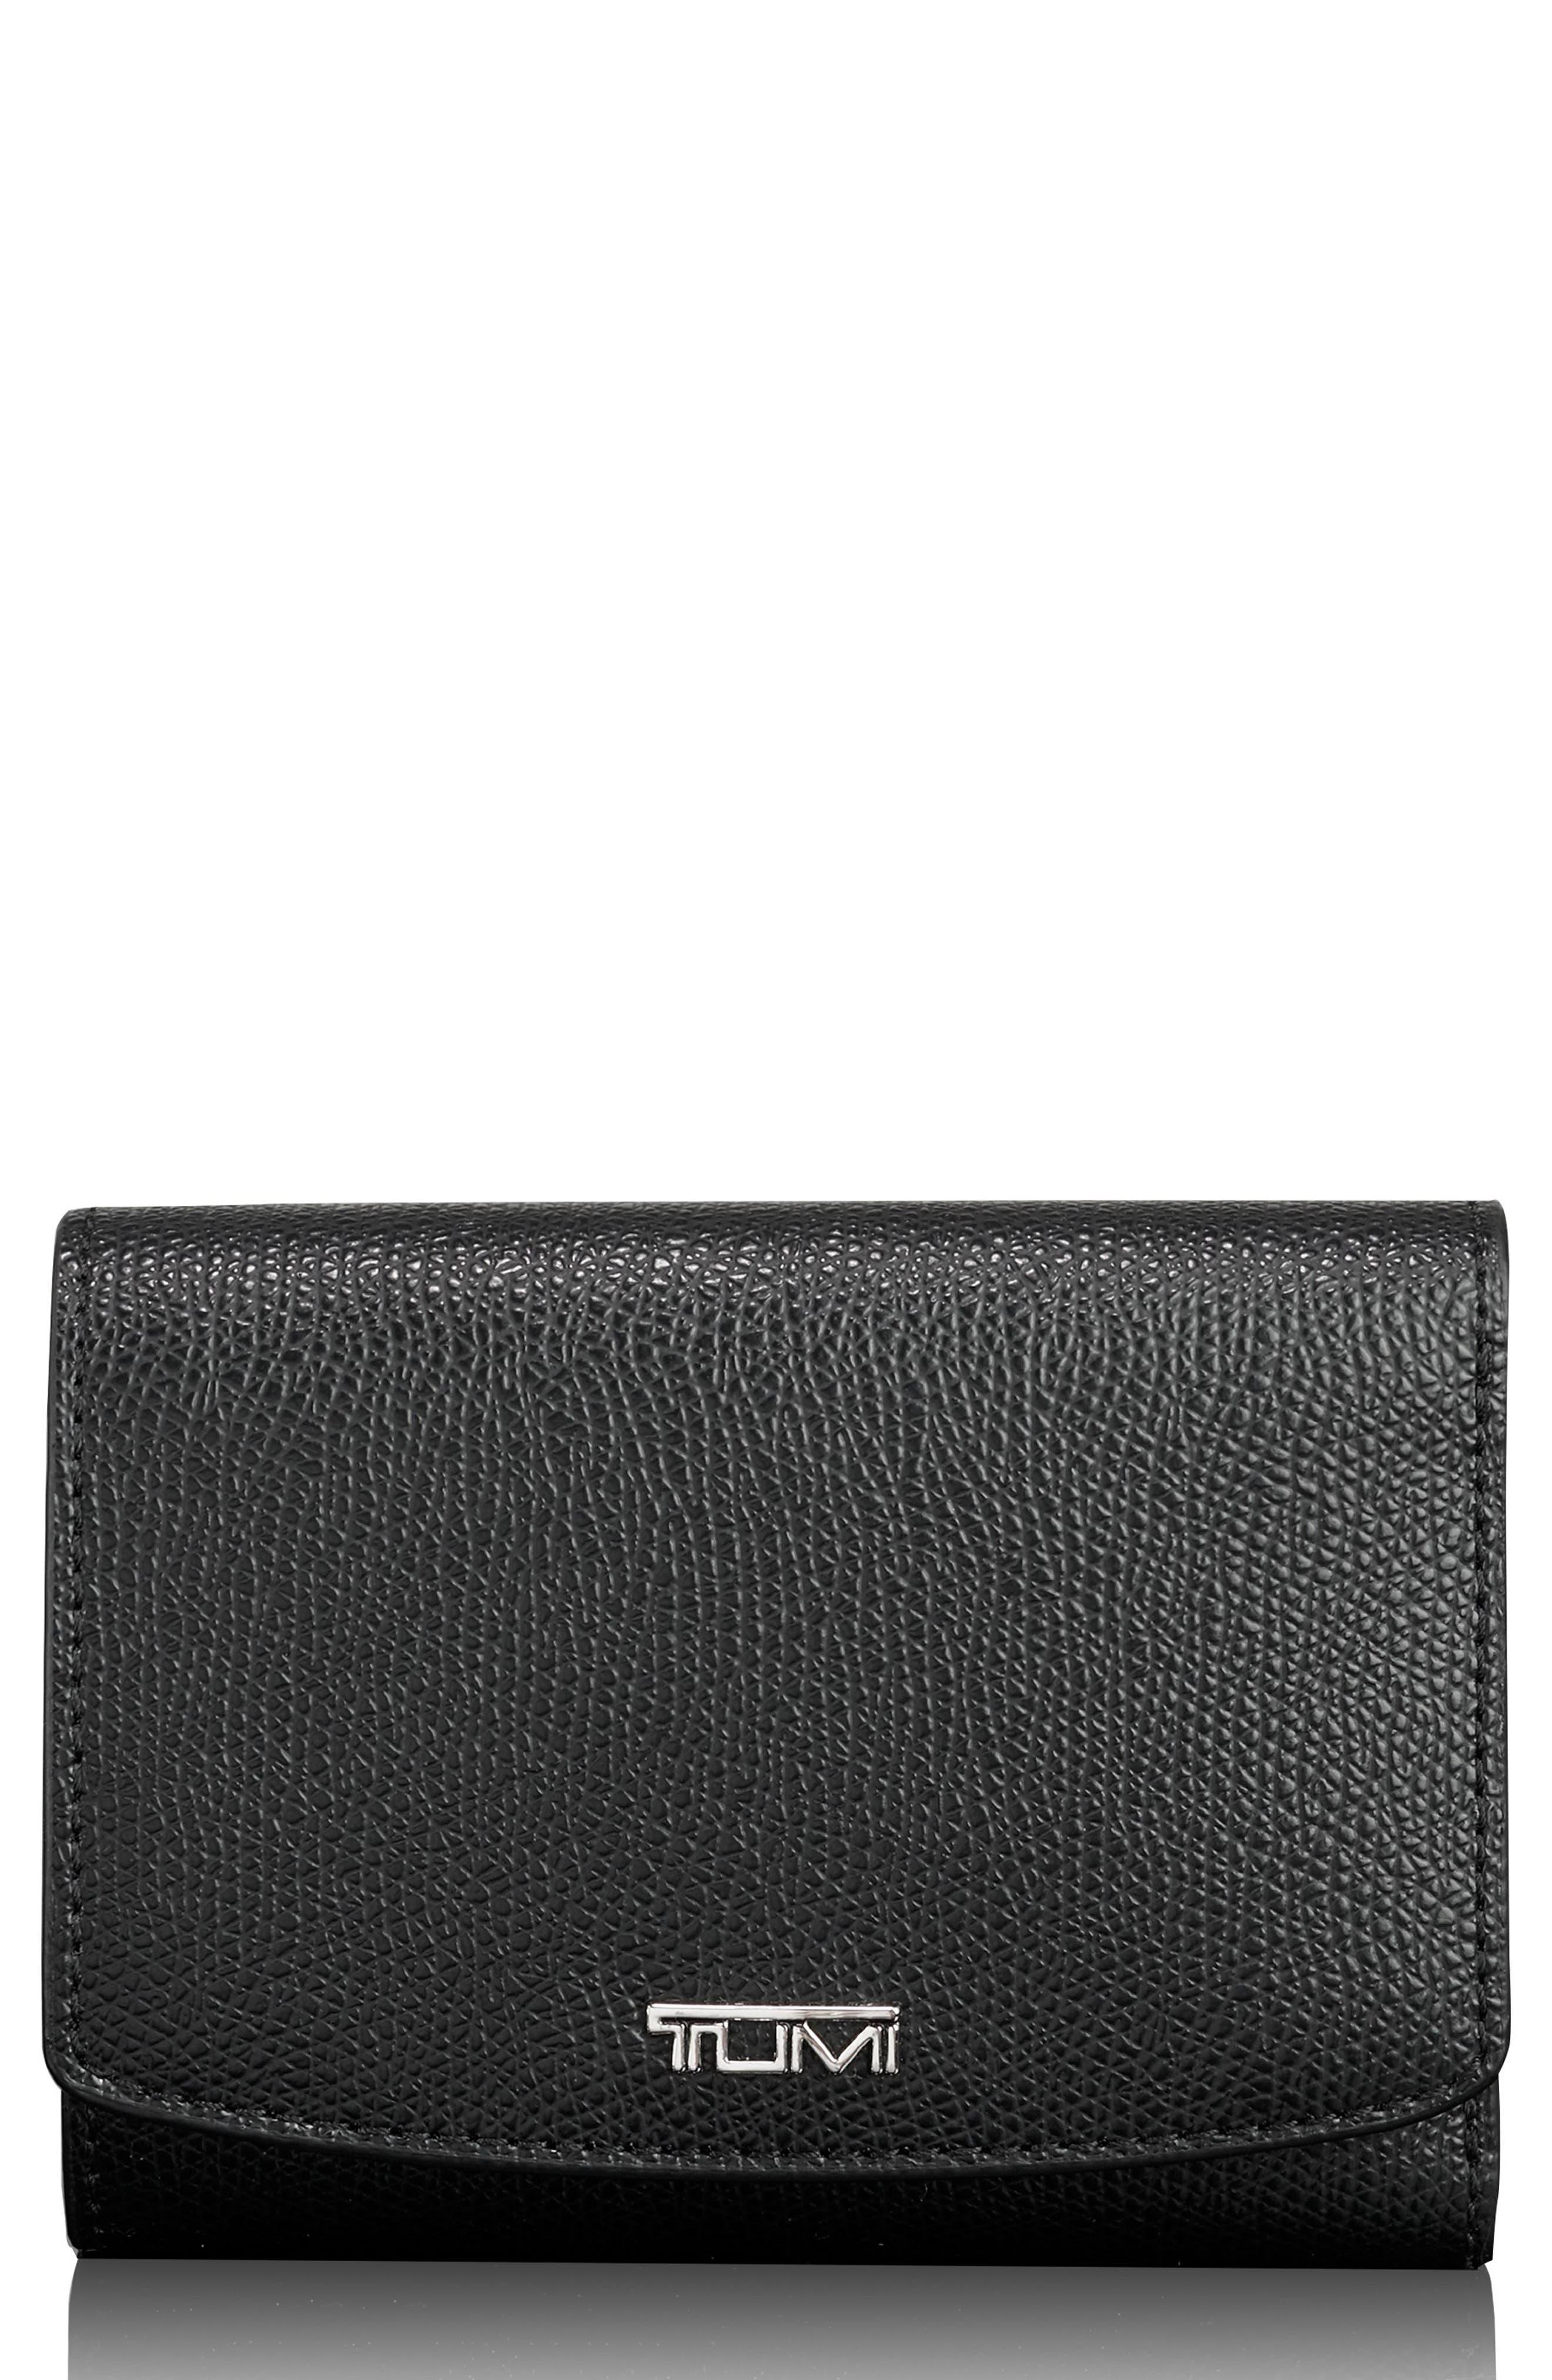 Main Image - Tumi RFID Trifold Wallet